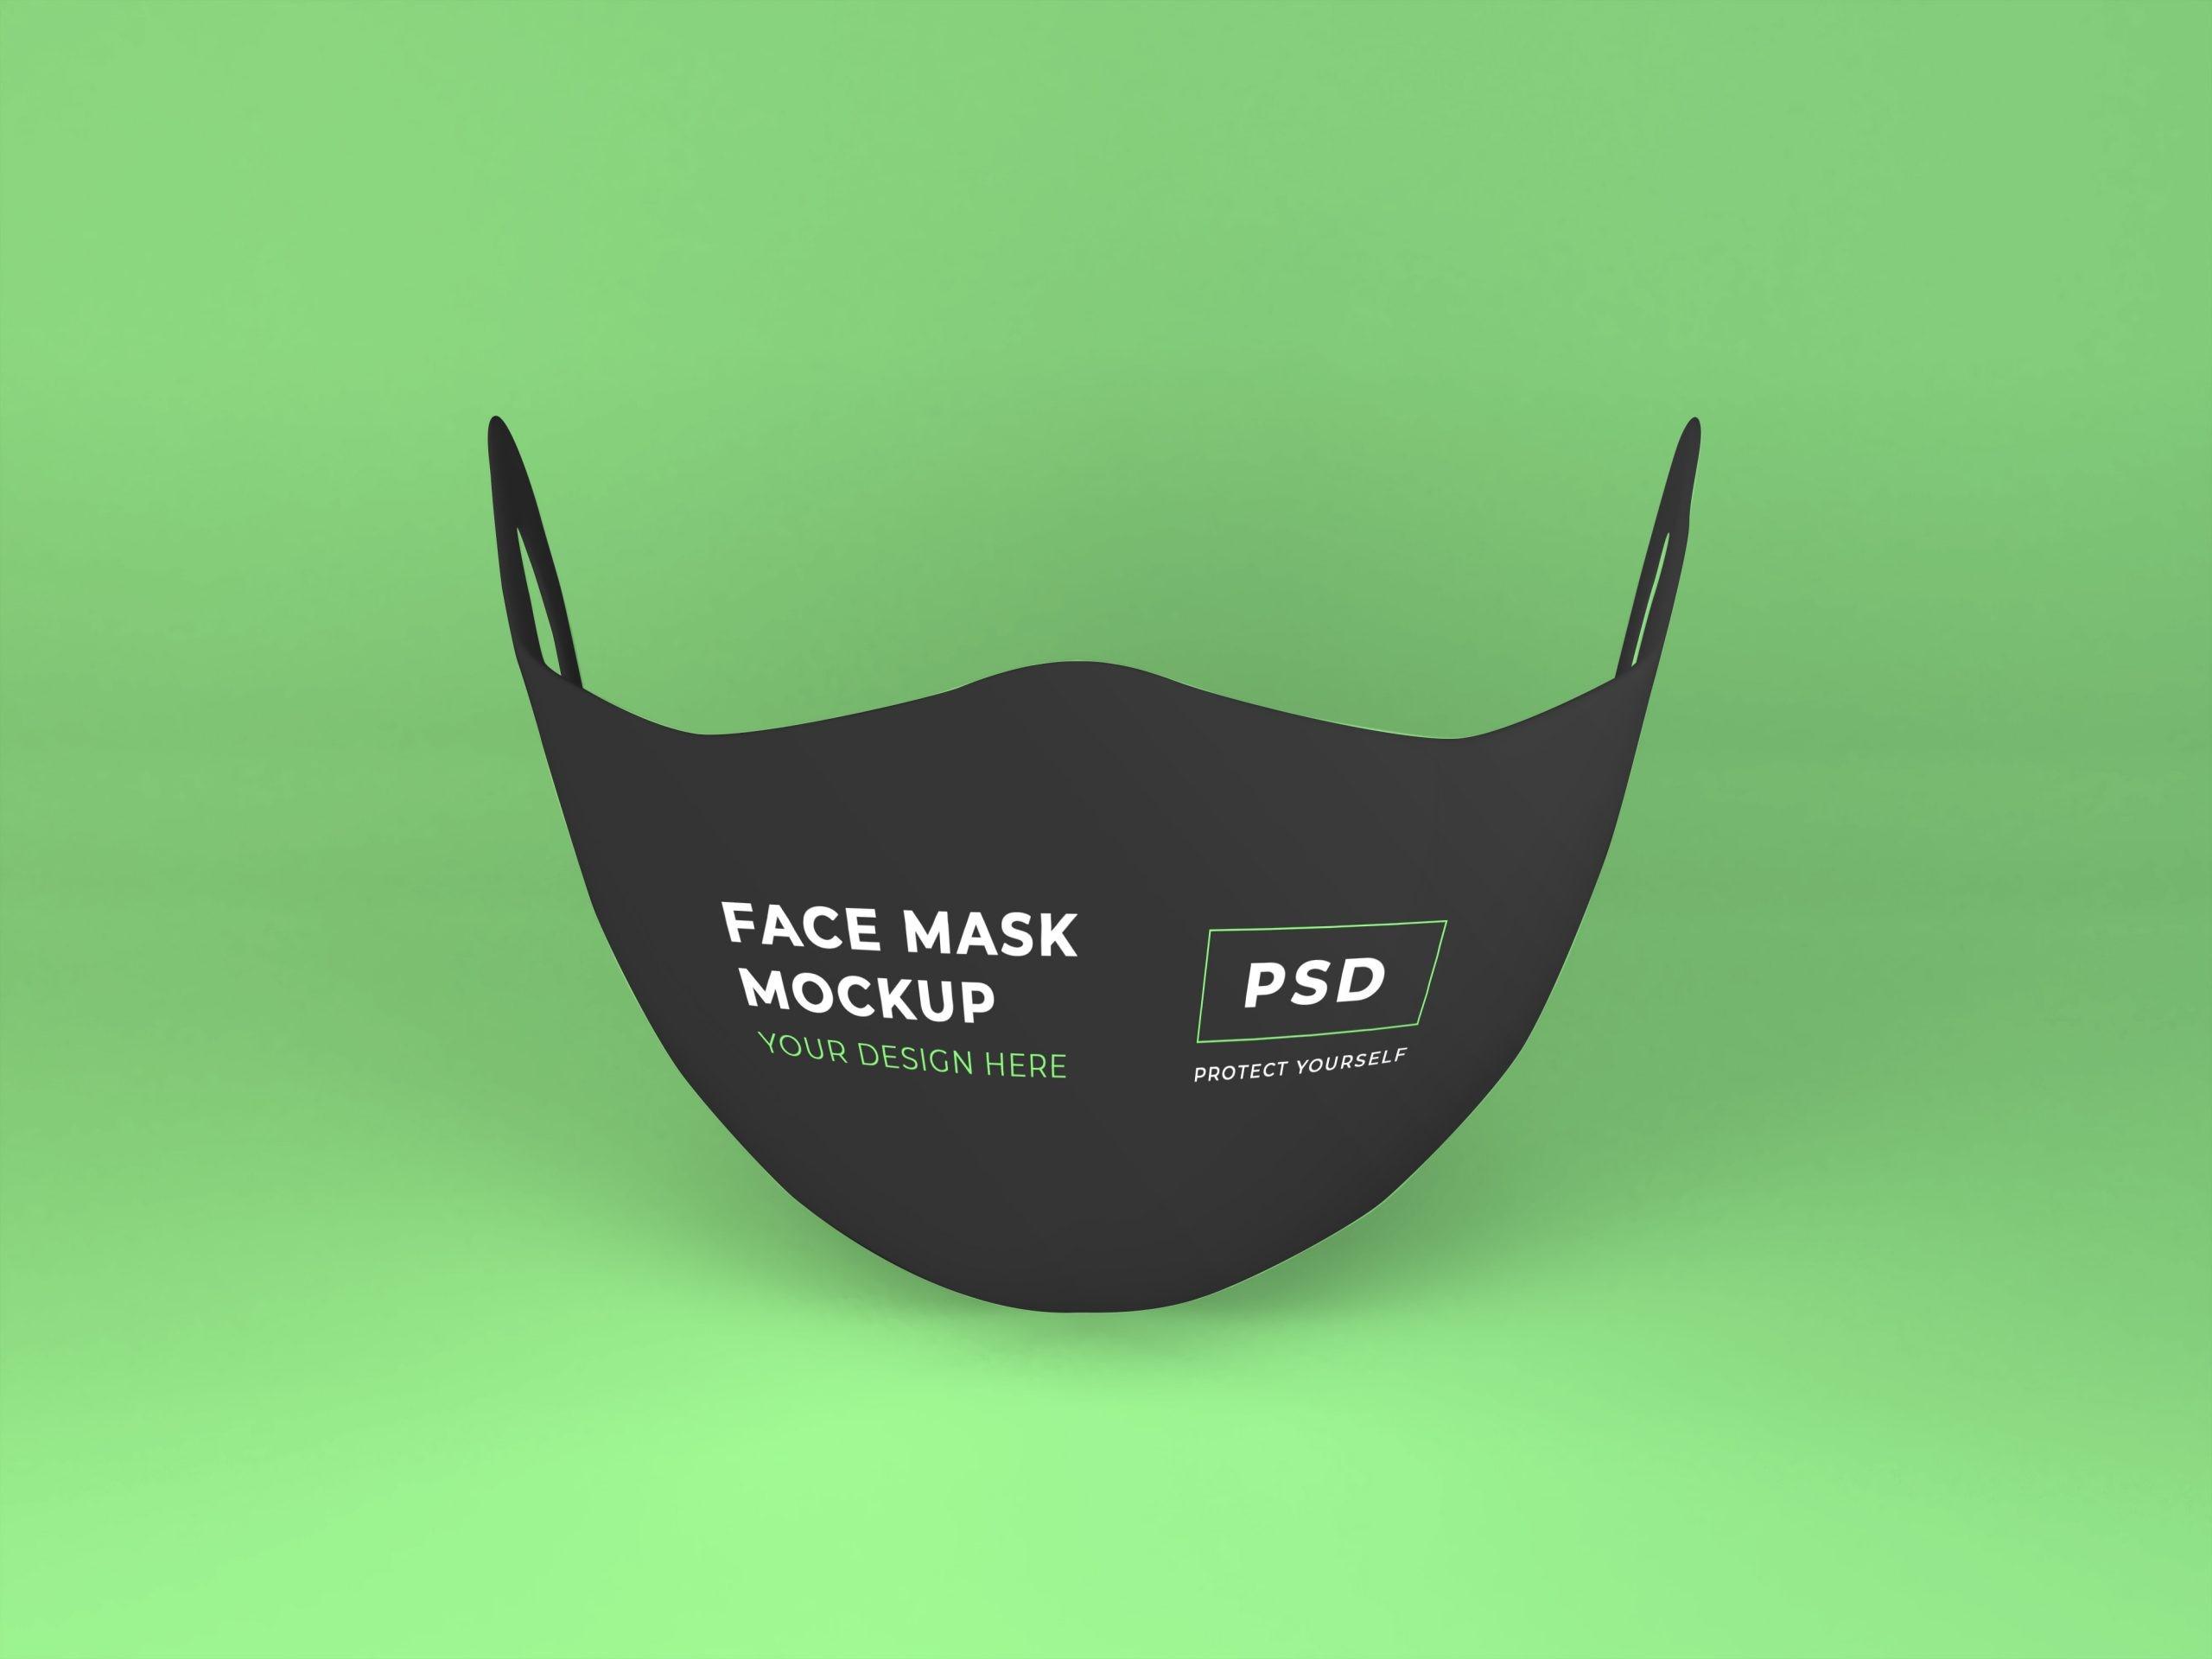 Realistic Face Mask Mockup Template - Free Mockup Download